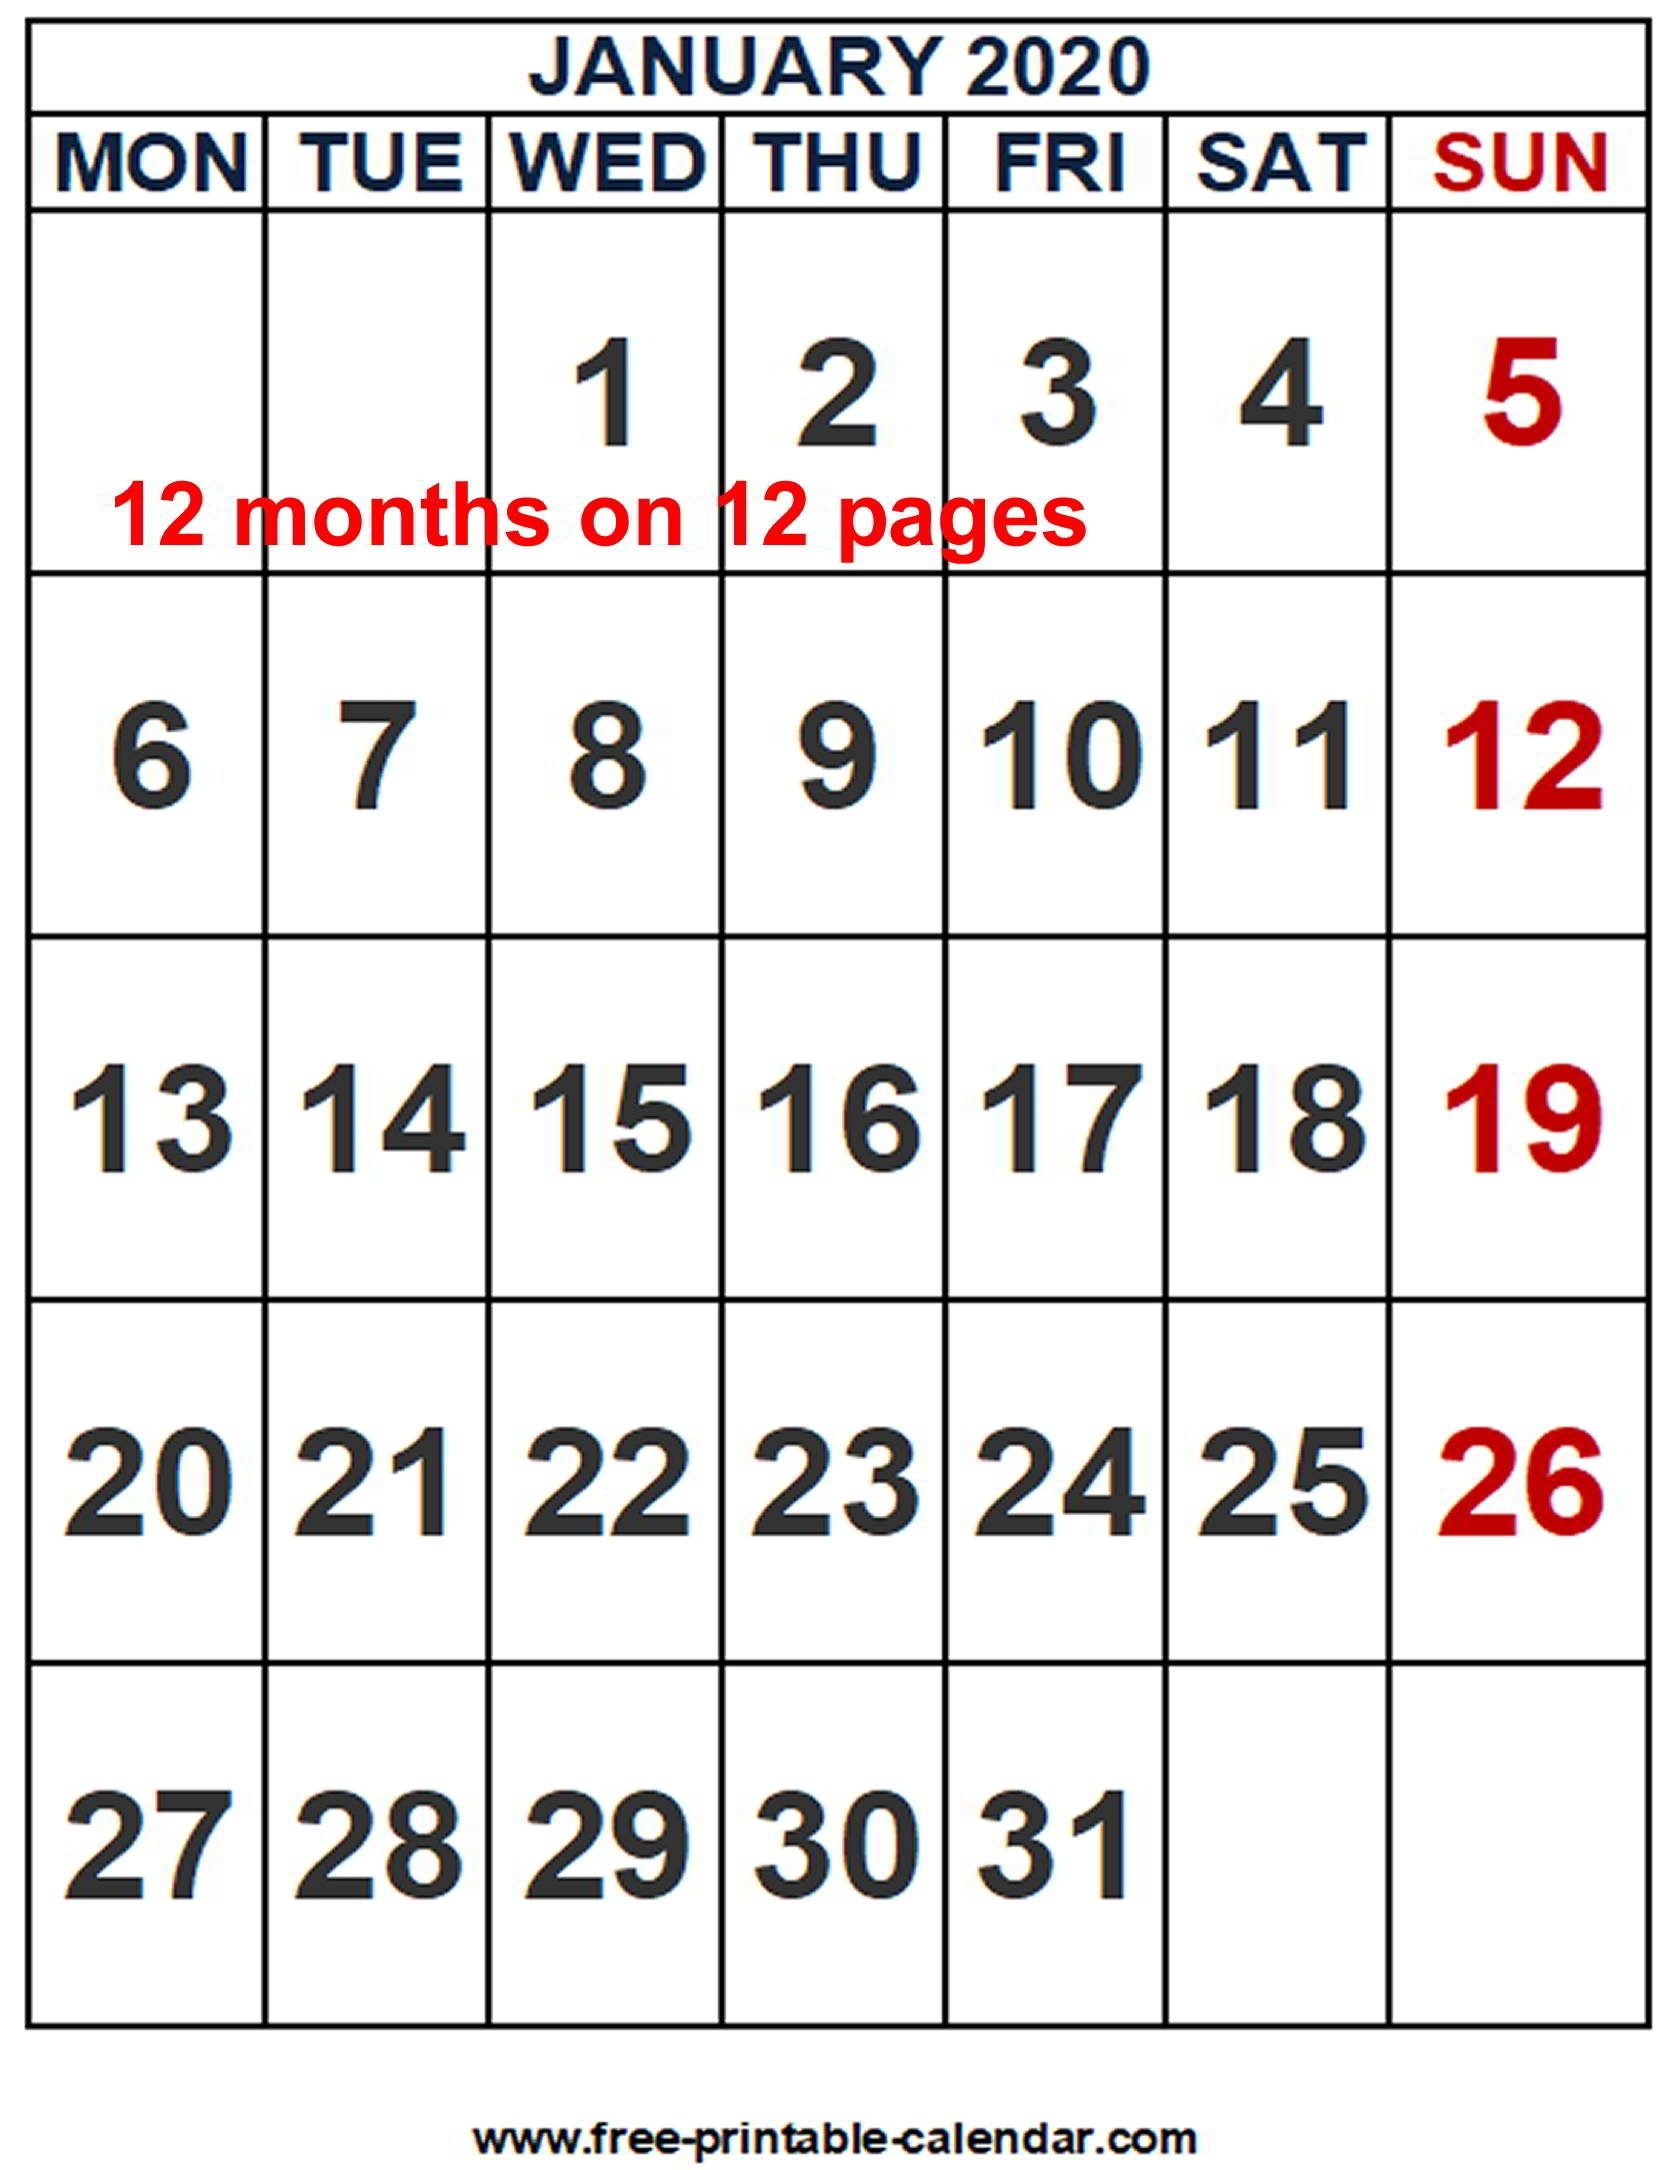 Free Word Calendar Templates 2020 - Wpa.wpart.co-Microsoft Word Calendar Templates 2020 Free